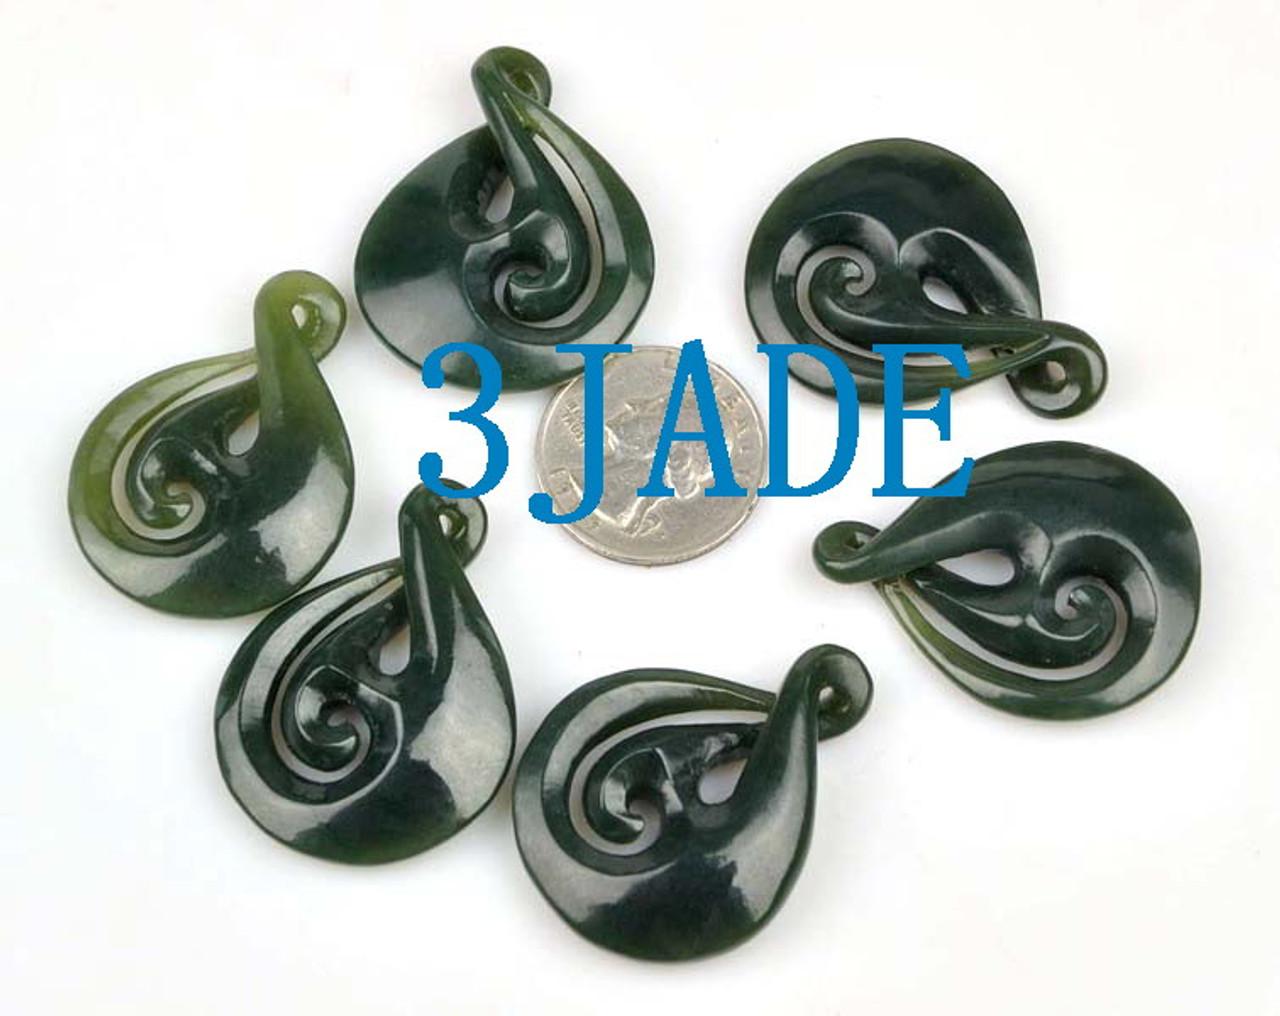 Natural Nephrite Jade Twist Manaia Pendant Greenstone Pounamu Necklace NZ Maori Carving -G012419